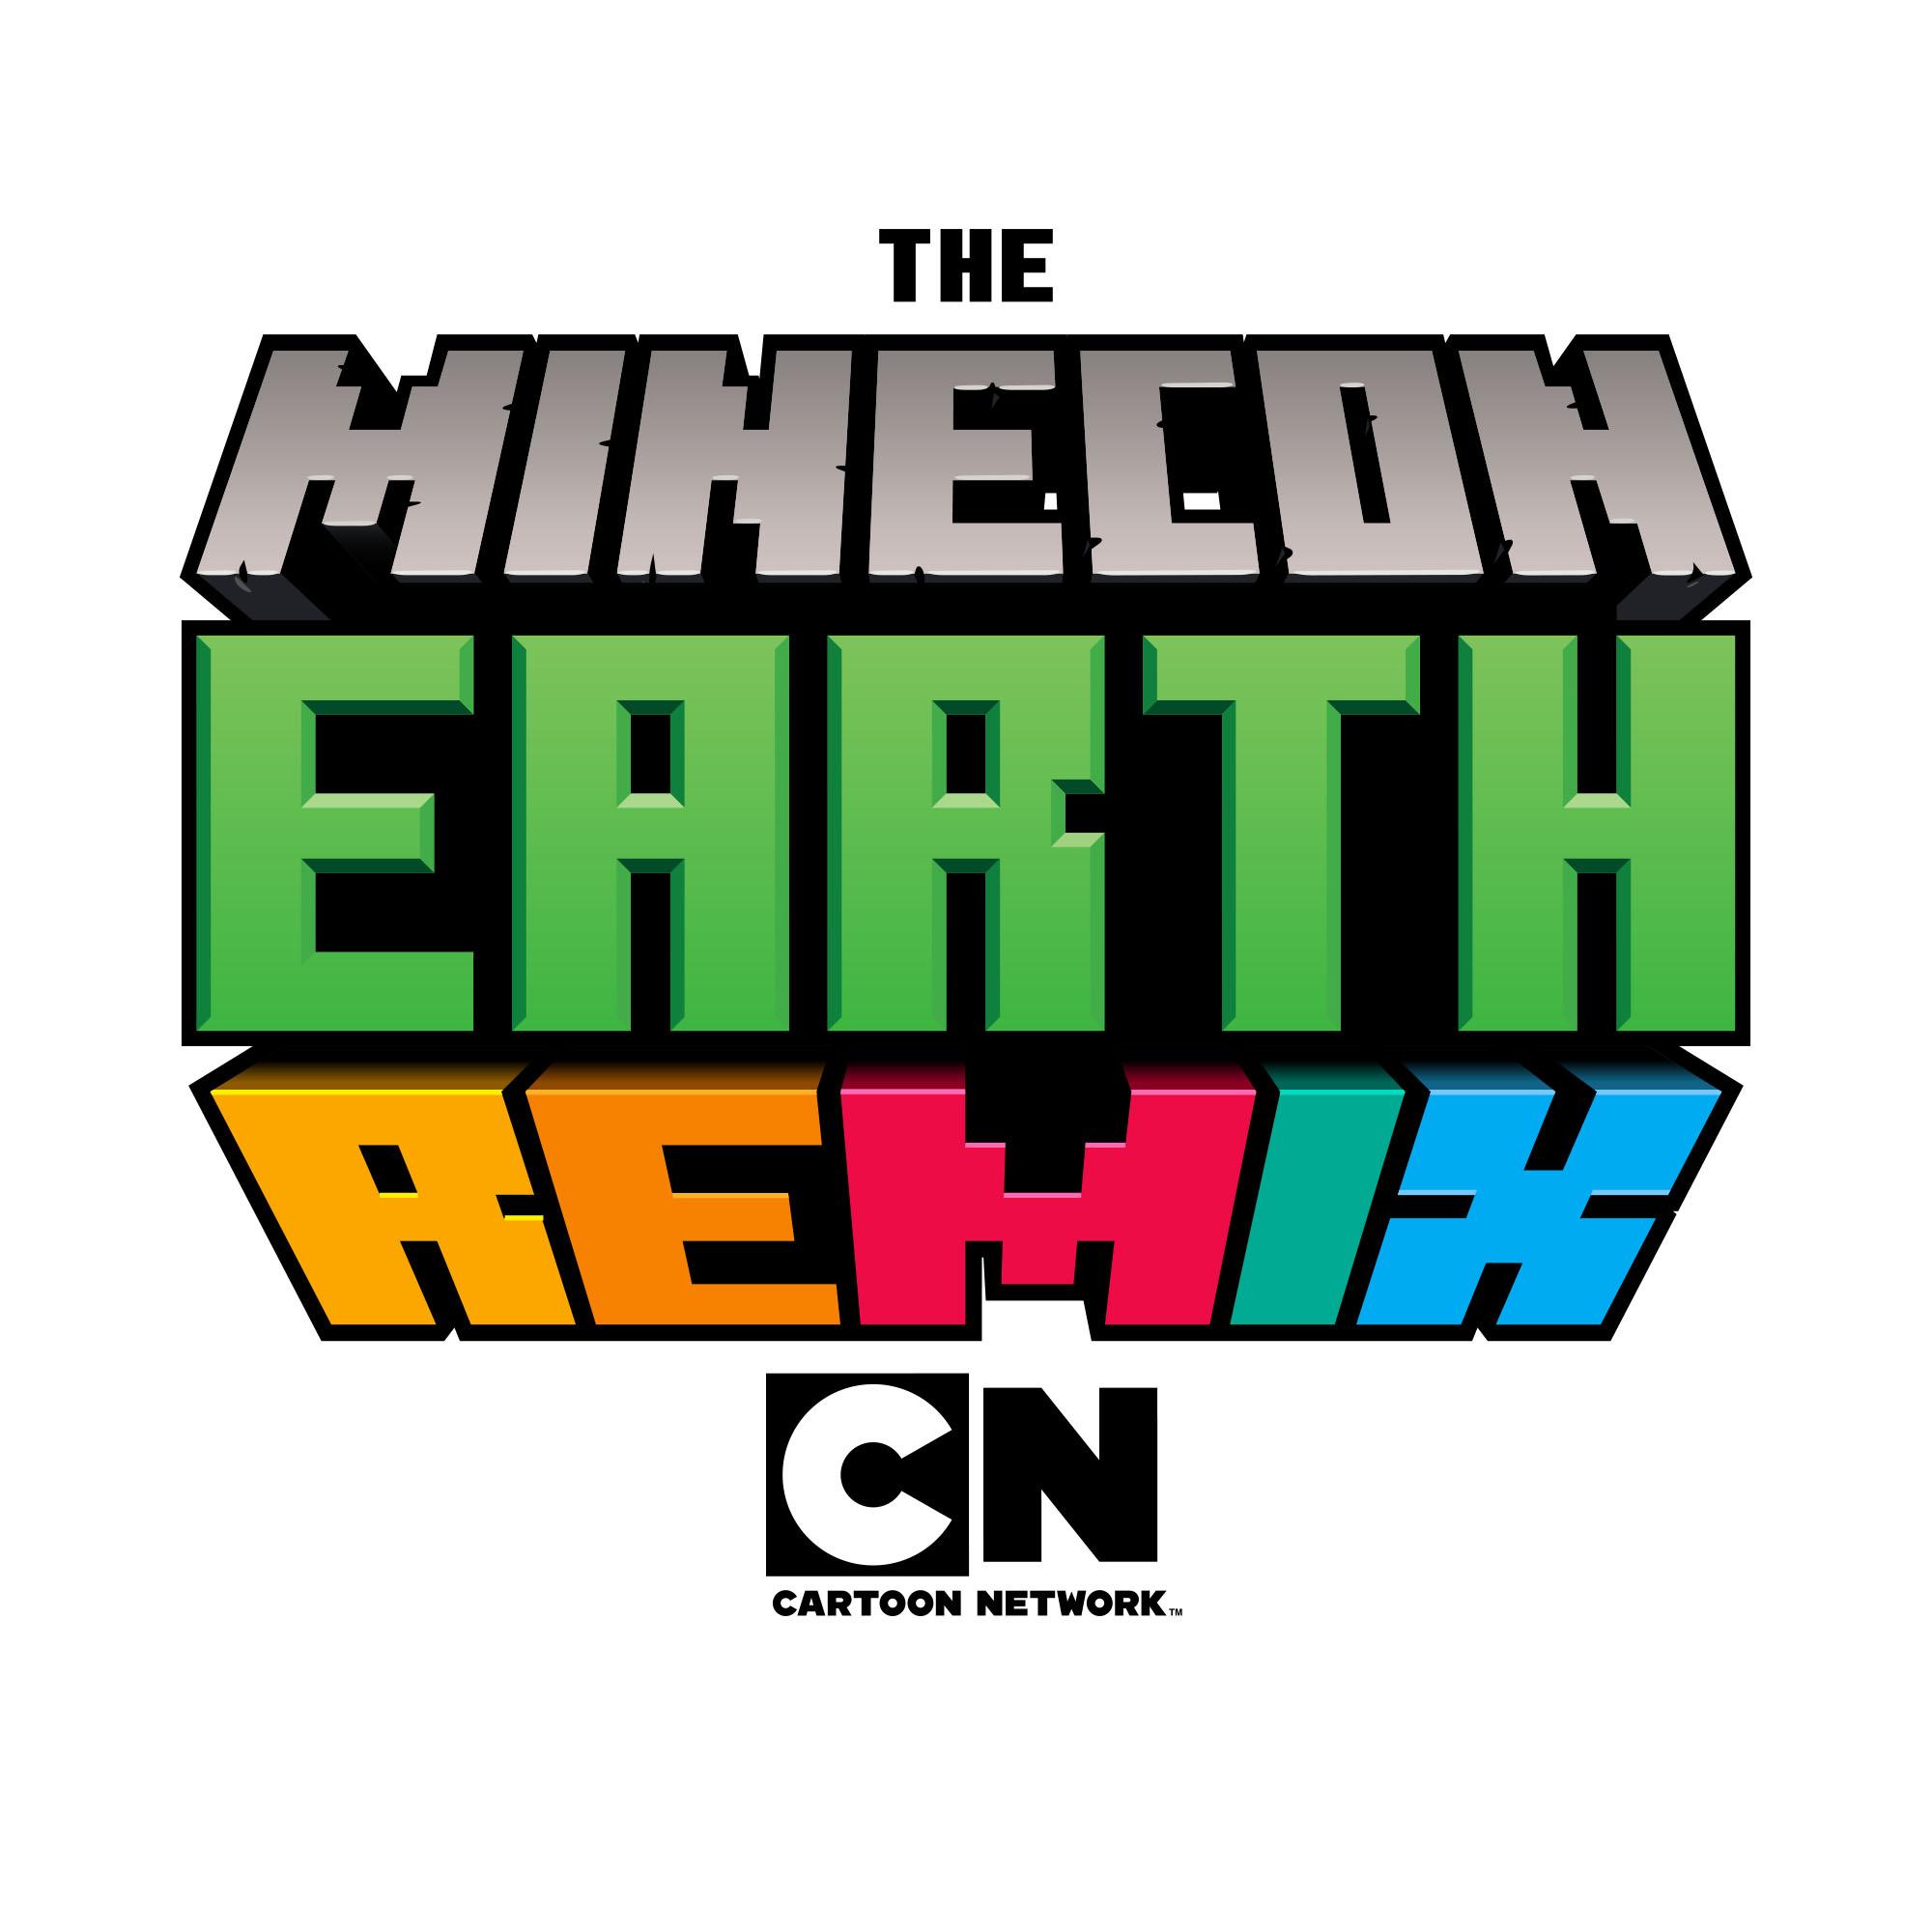 cartoon network minecraft partner for sept 29 minecon earth